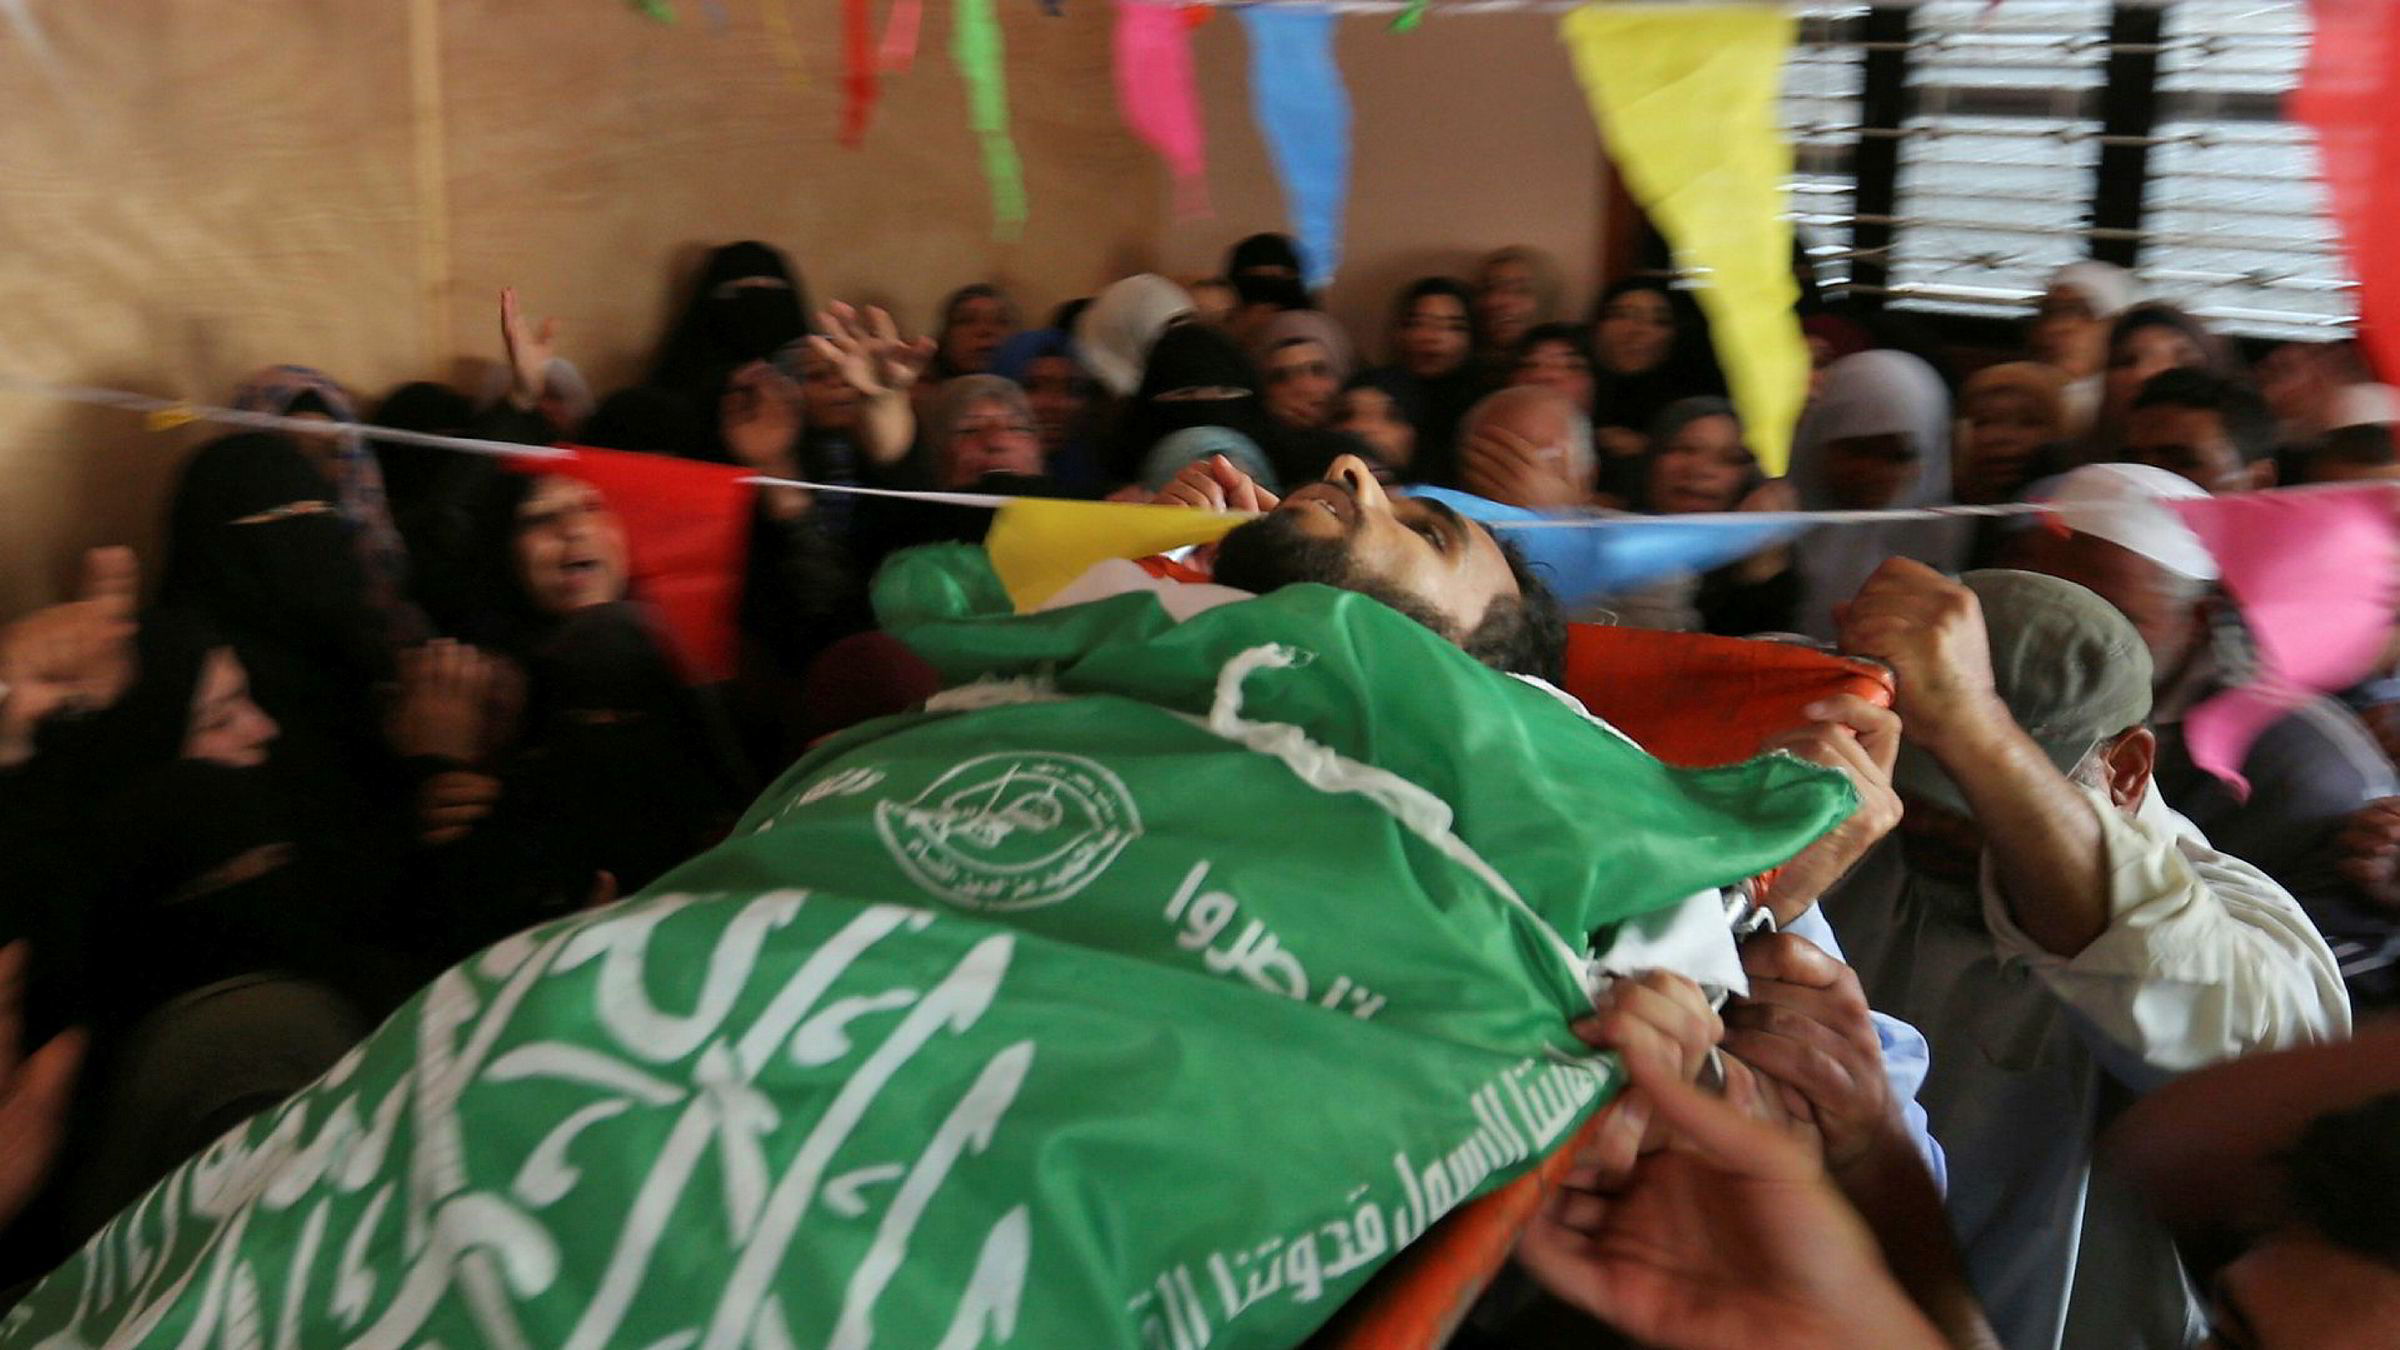 Sørgende bærer kroppen til Mohammed Dwedar, en 27 år gammel palestiner drept av israelske soldater ved grensen til Gaza i forbindelse med protester mot USAs ambassade i Jerusalem.